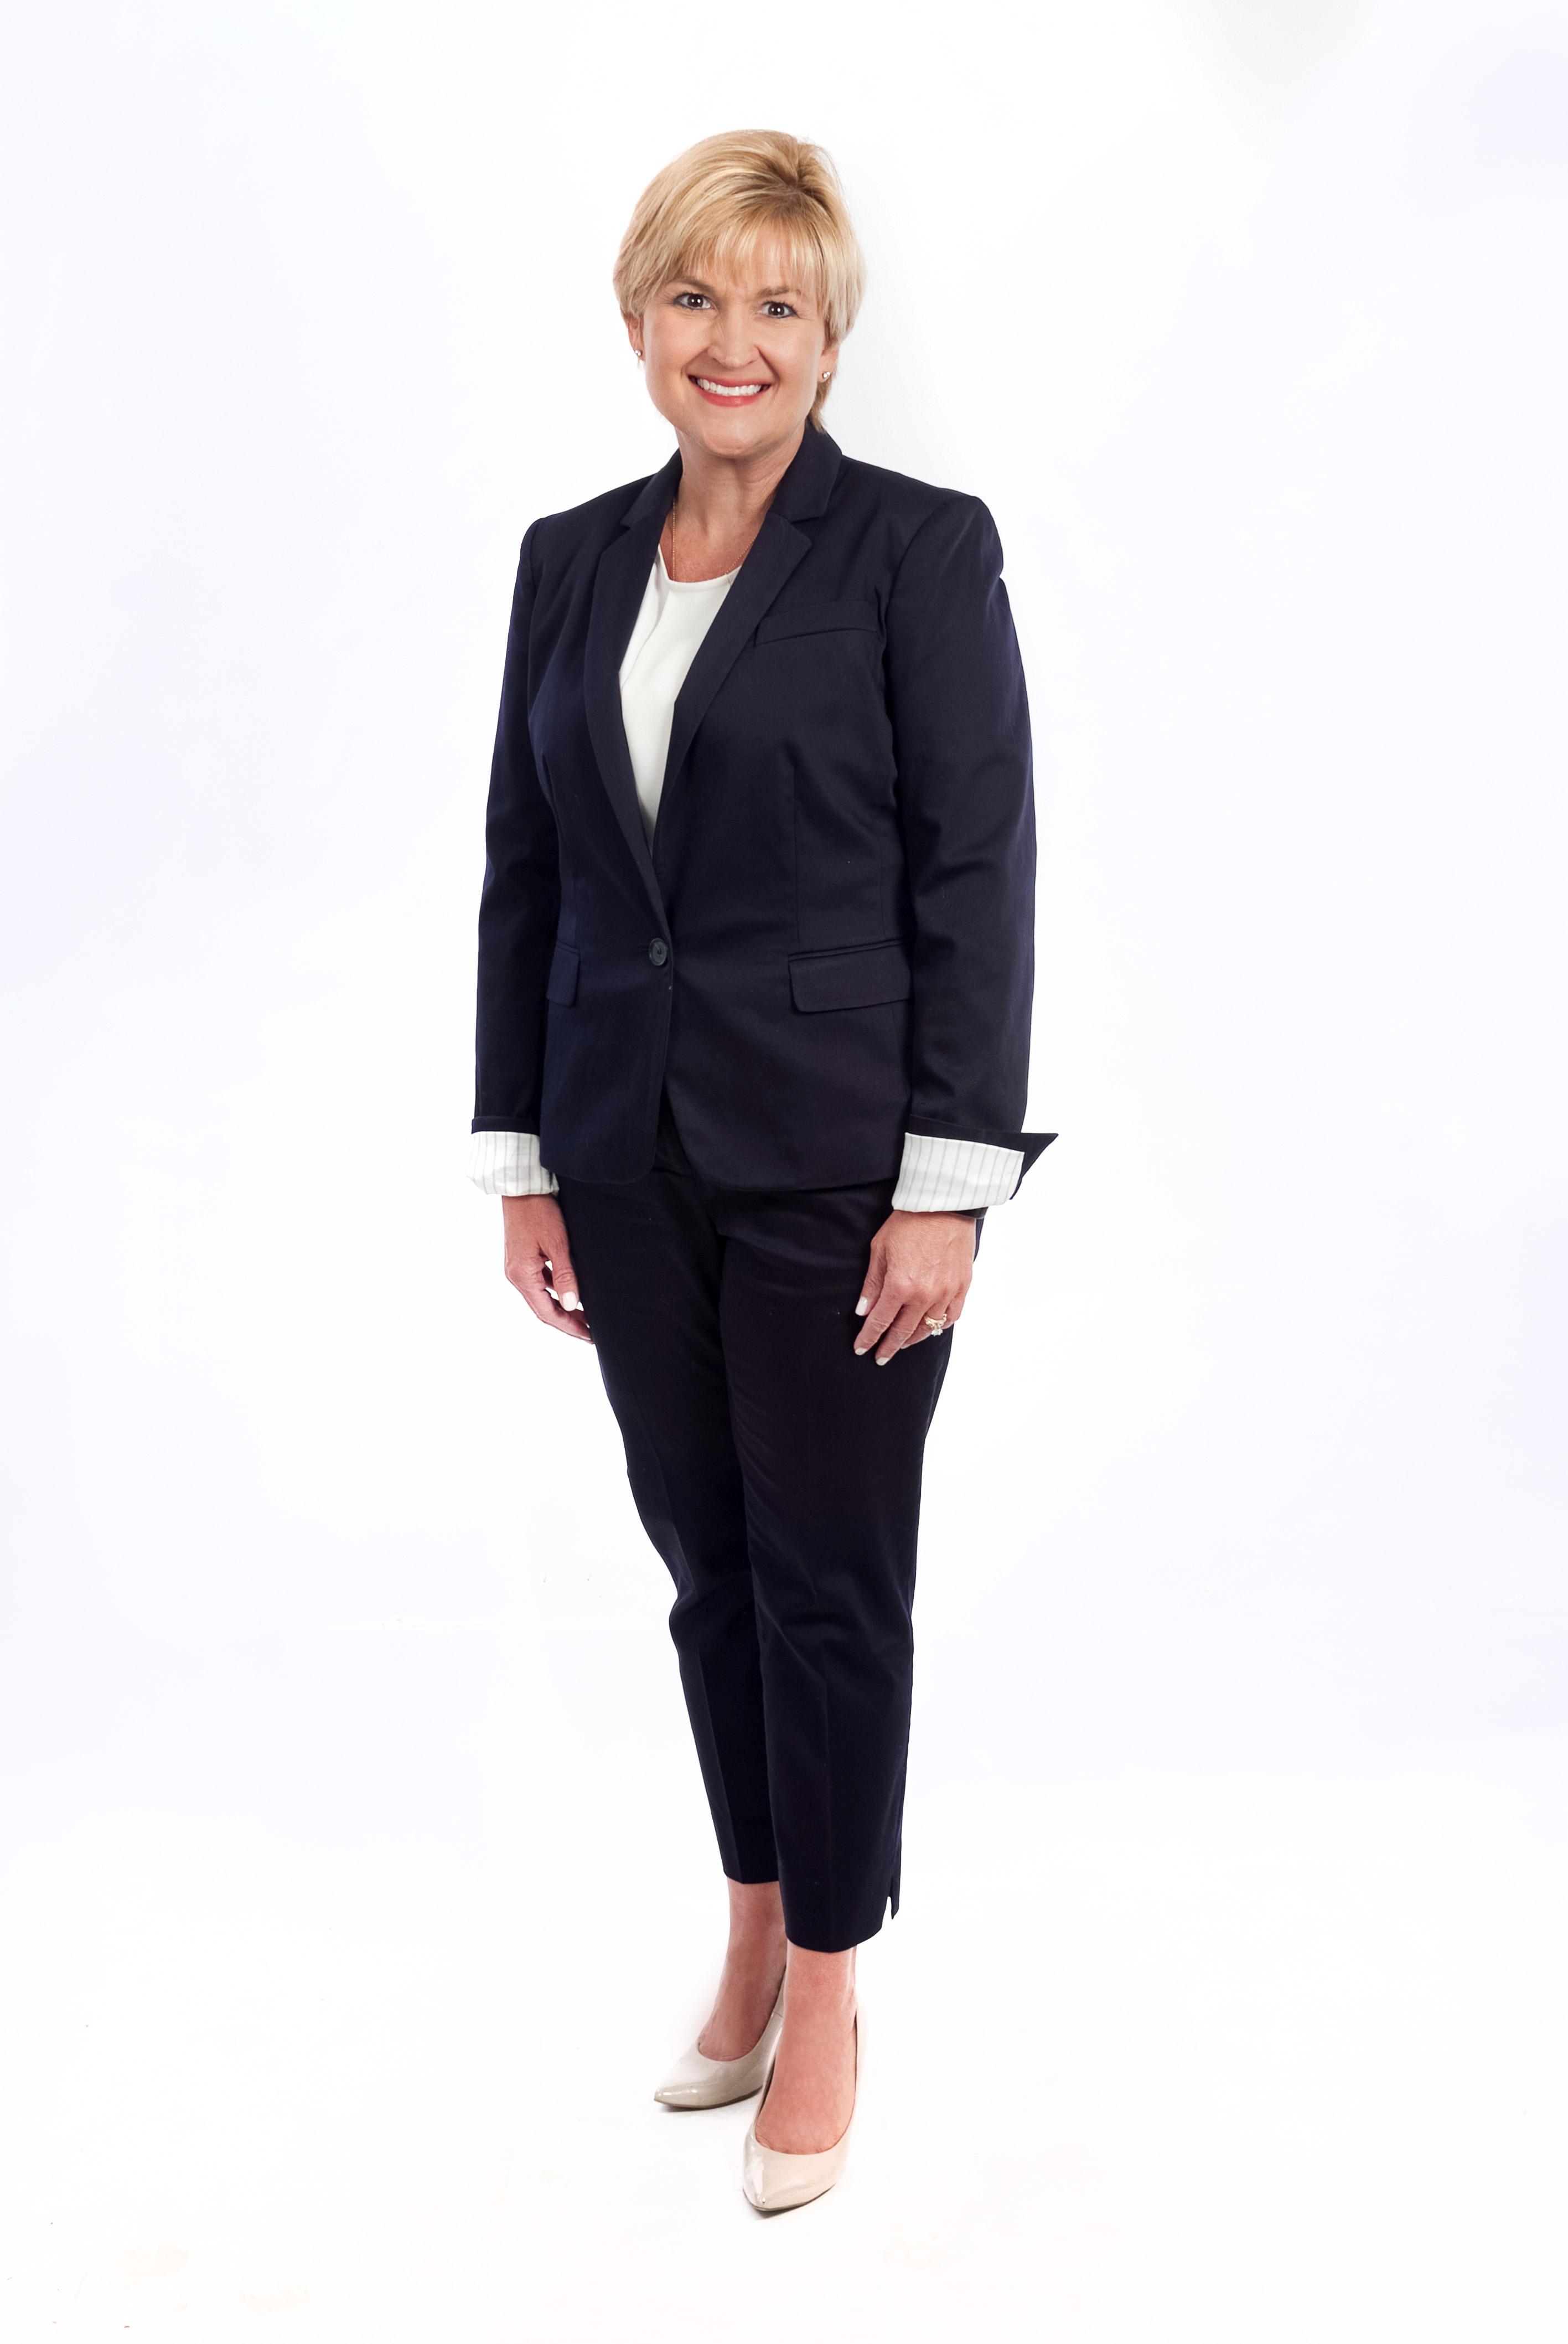 Executive Spotlight Campus Federal Credit Union S Next Ceo Jane Verret